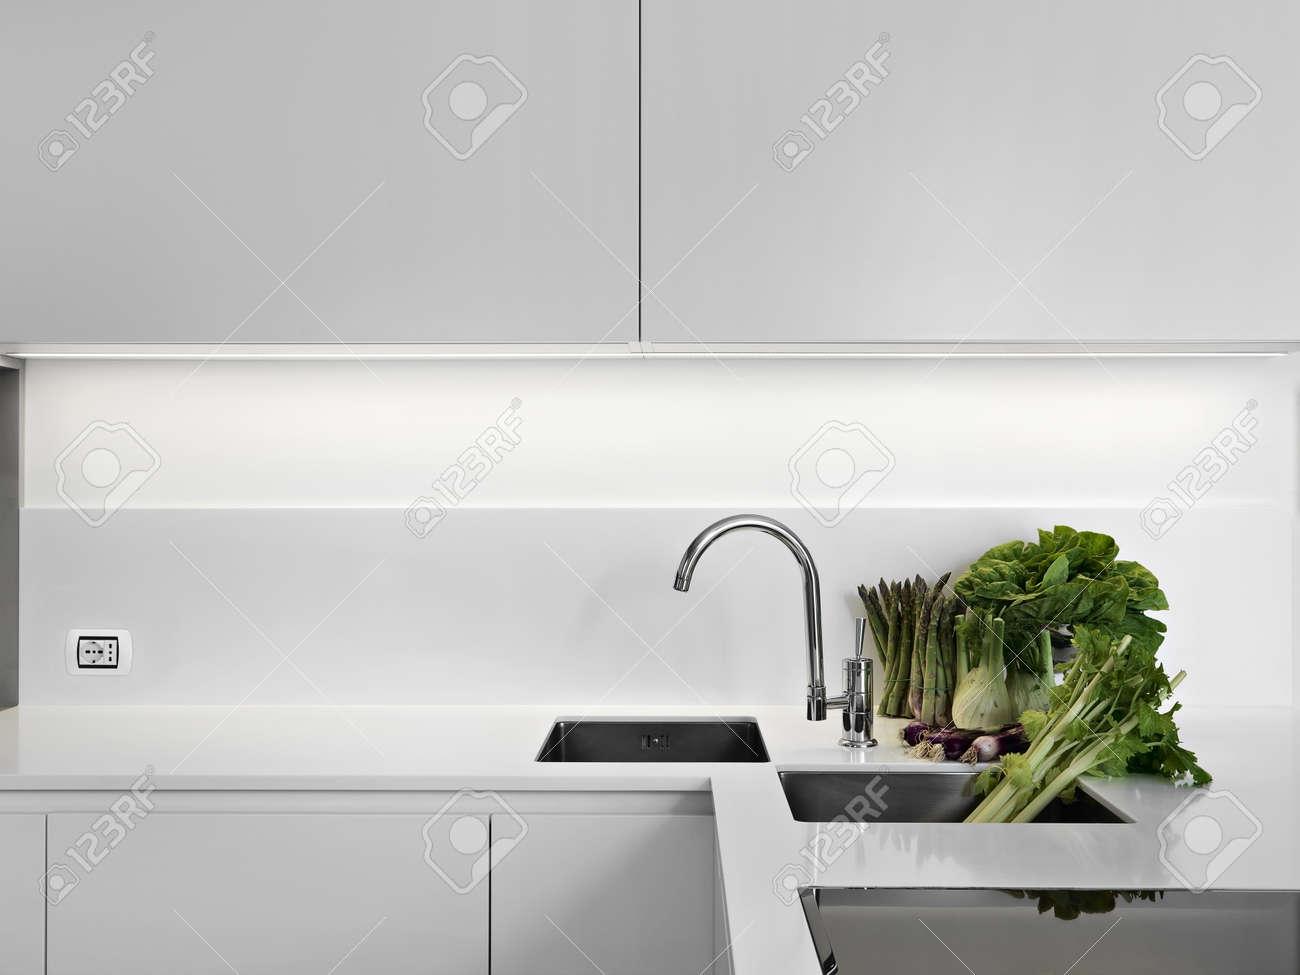 modern white laminate kitchen with vegetables on the white worktop Stock Photo - 15375078